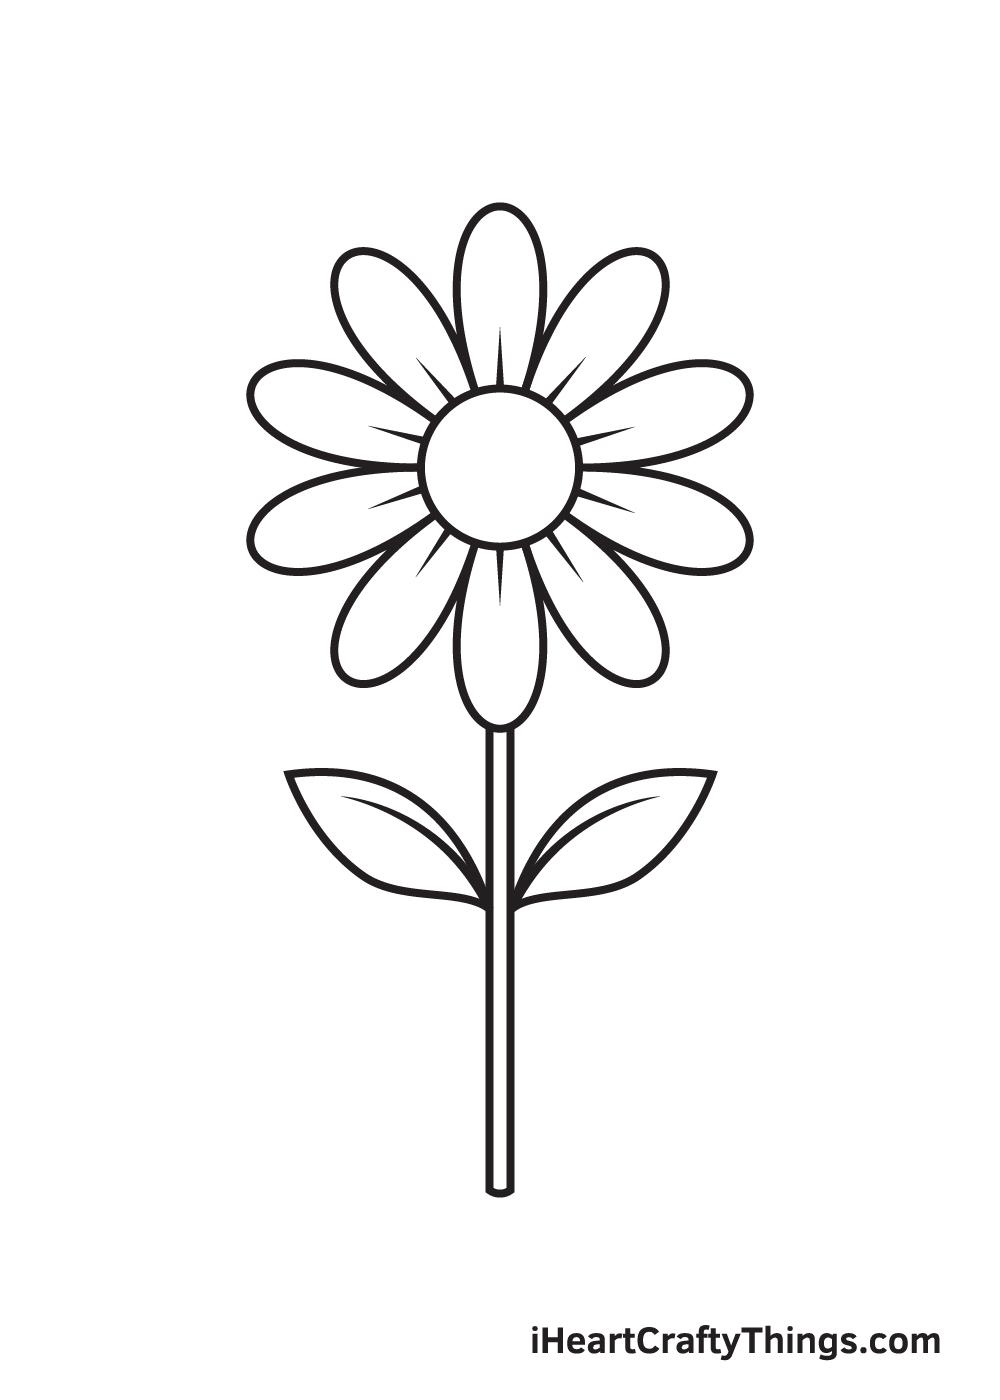 daisy drawing - step 8